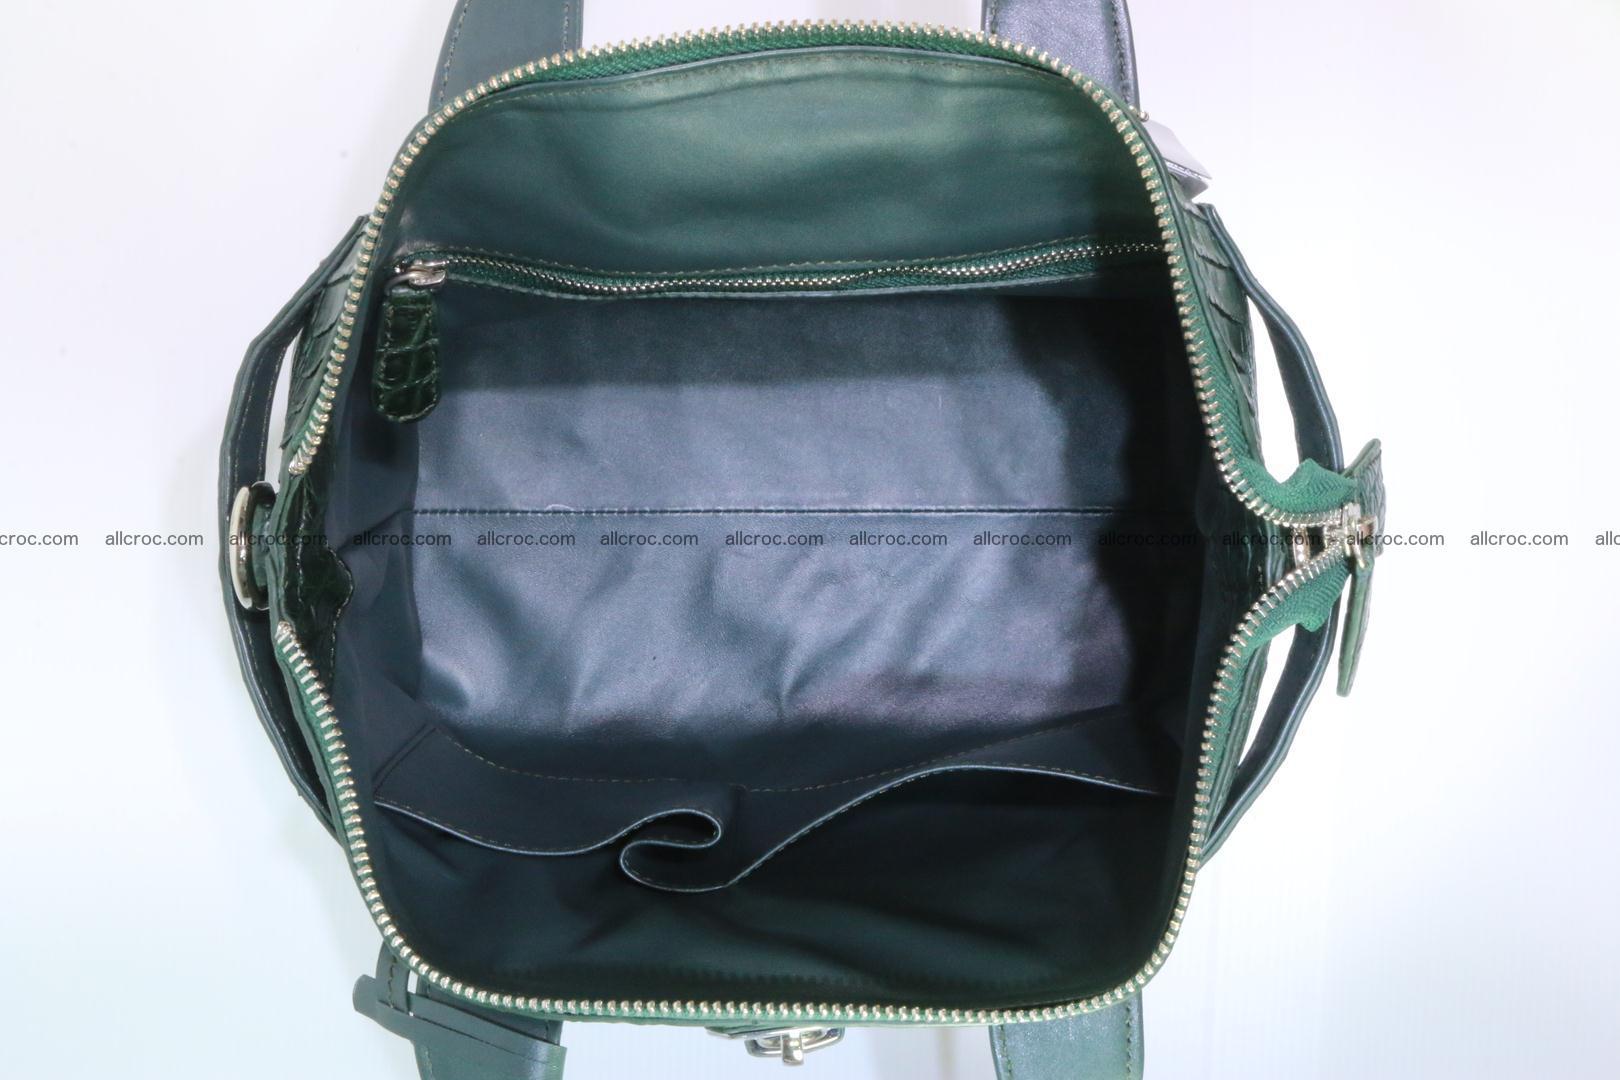 Genuine crocodile handbag for ladies 047 Foto 13